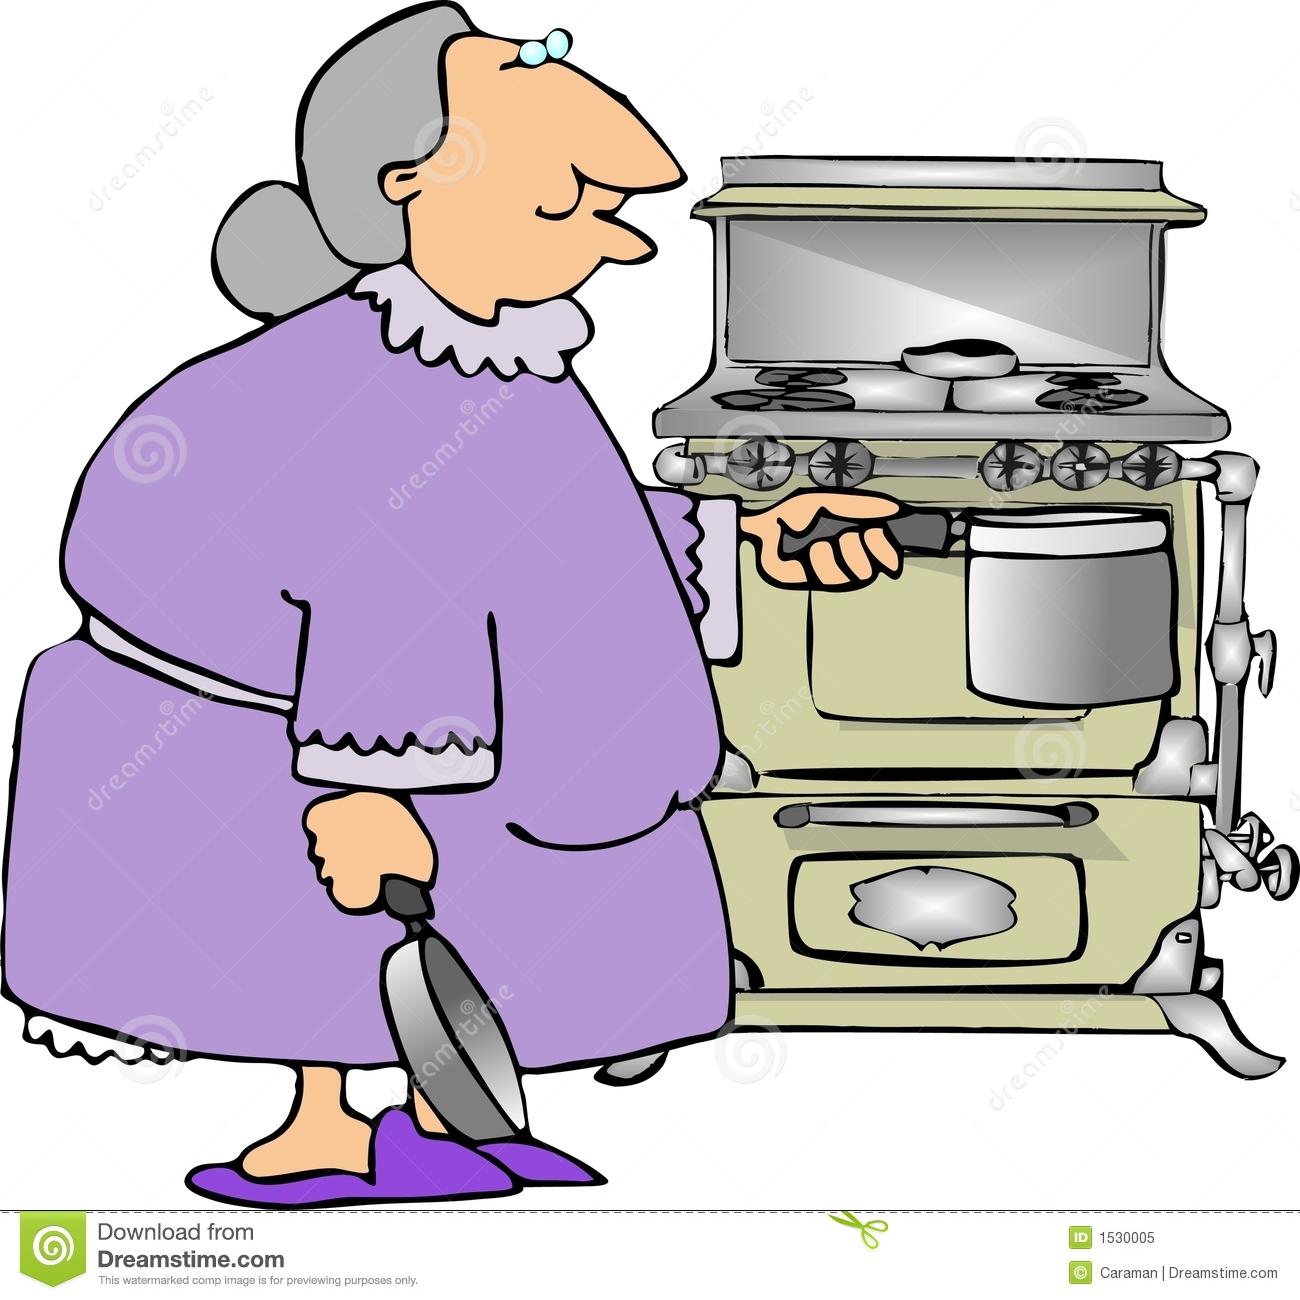 Grandma baking clipart svg free download Grandmother Clipart Free | Free download best Grandmother Clipart ... svg free download